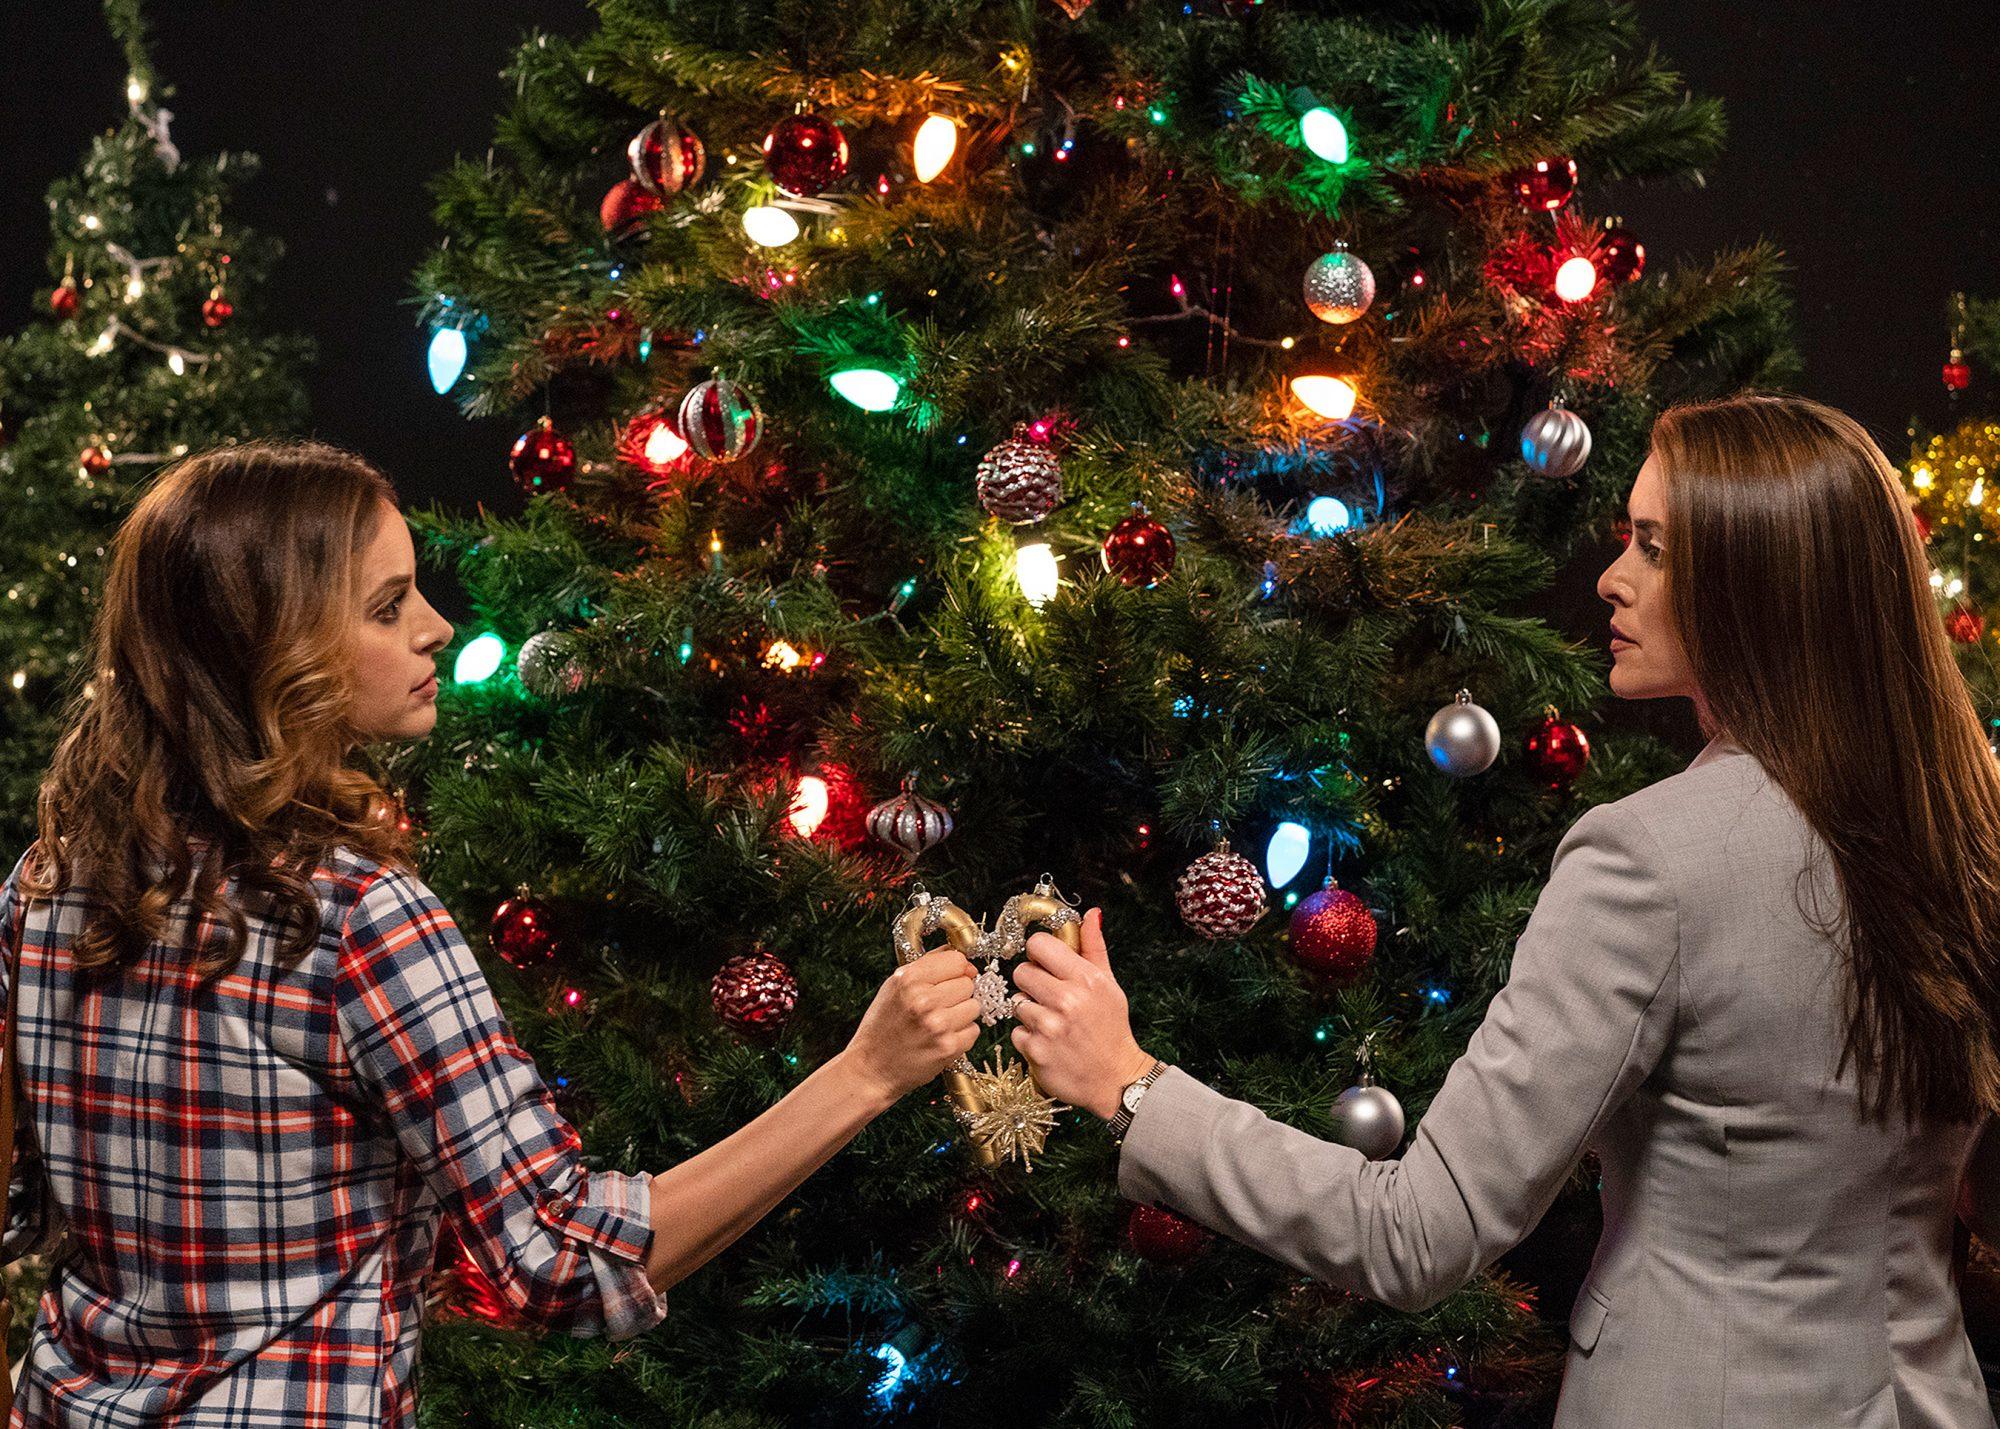 A Christmas Switch UPTV Christmas moviesCredit: UPTV